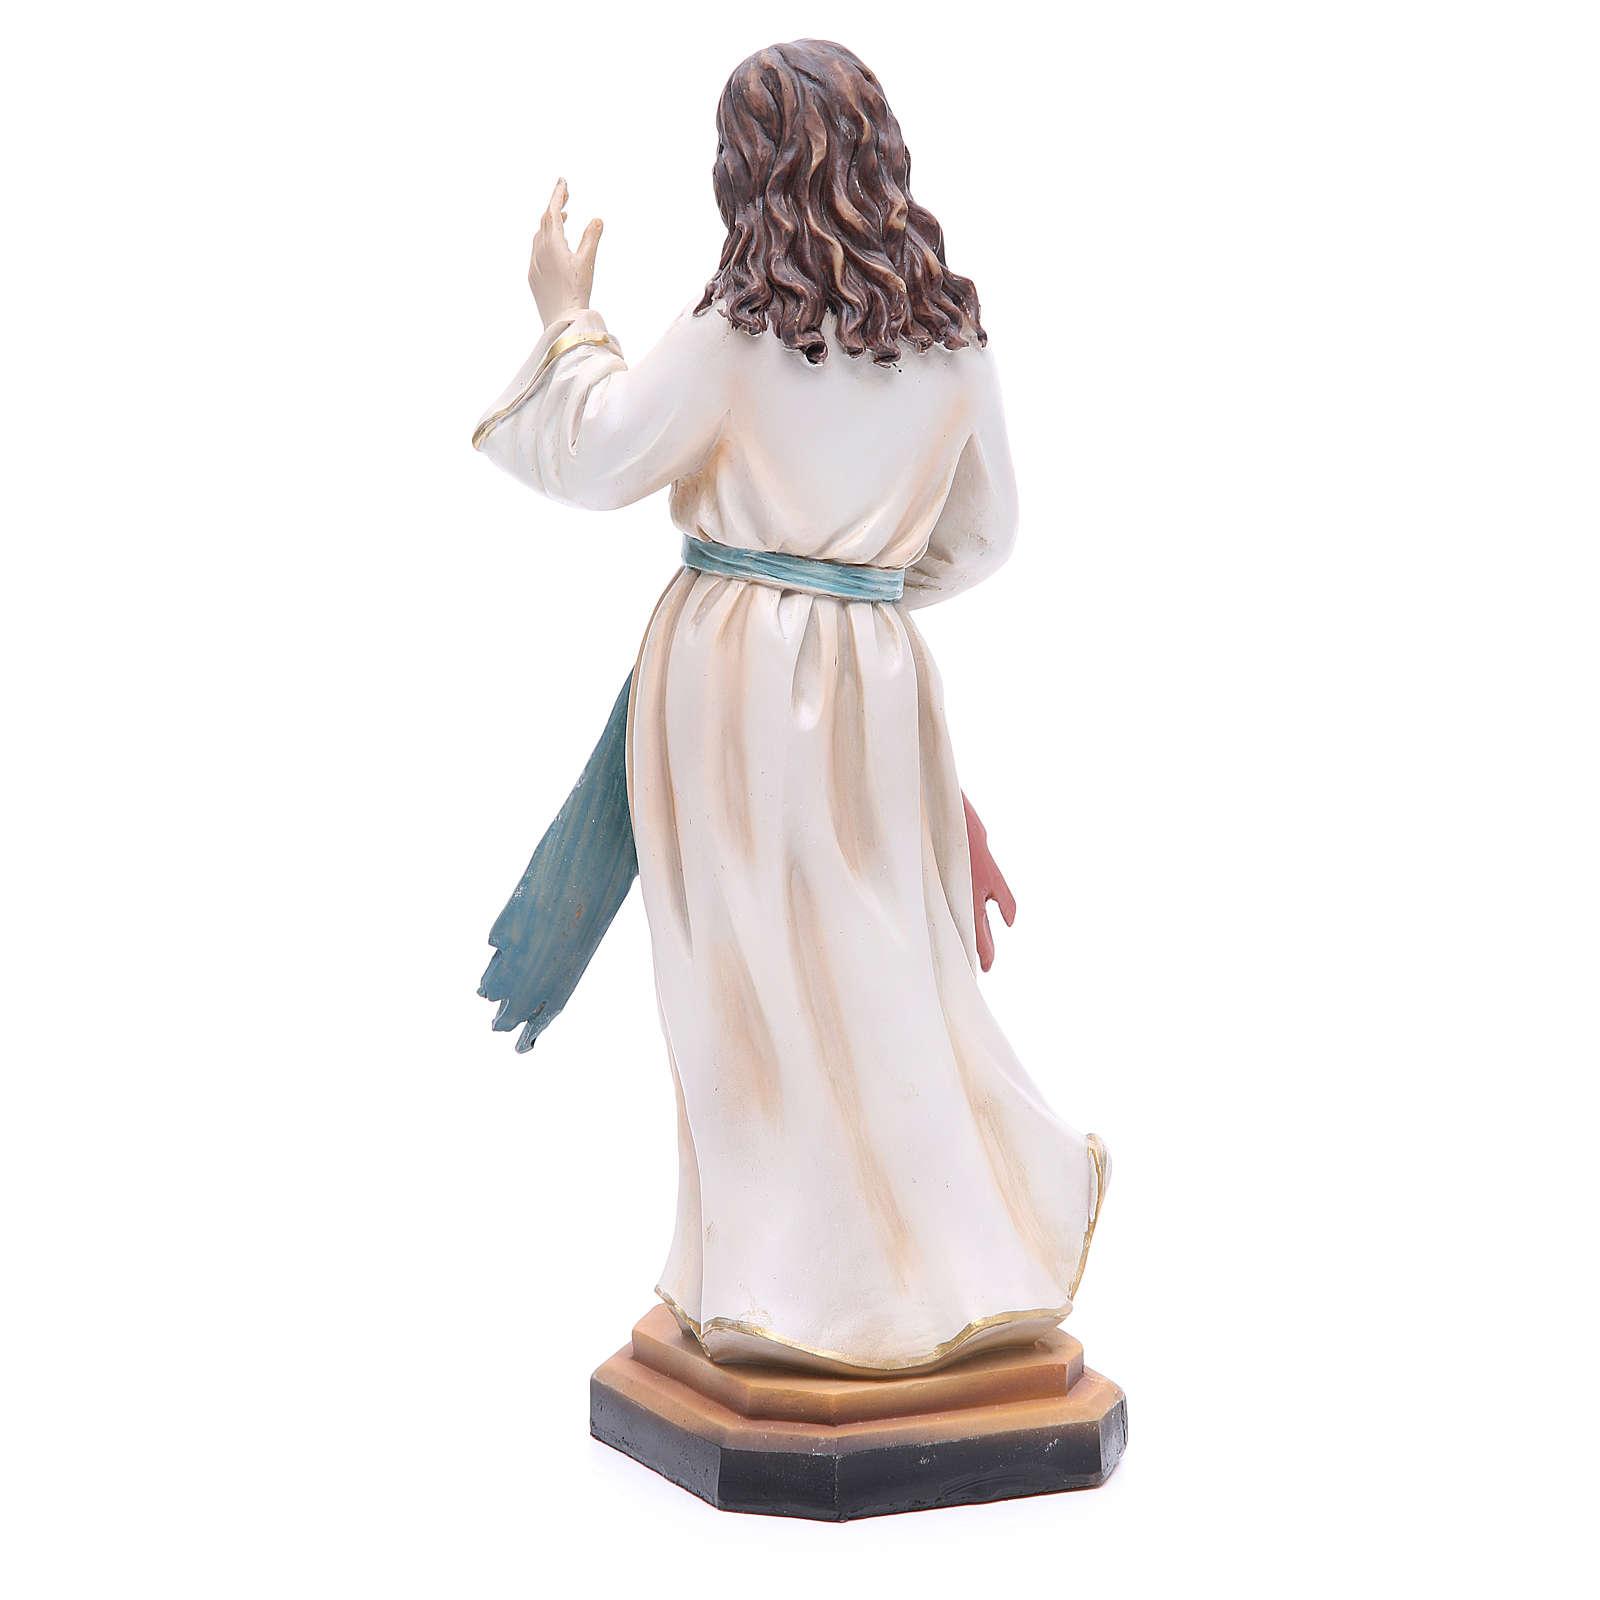 Imagem Jesus Misericordioso em resina 31,5 cm 4